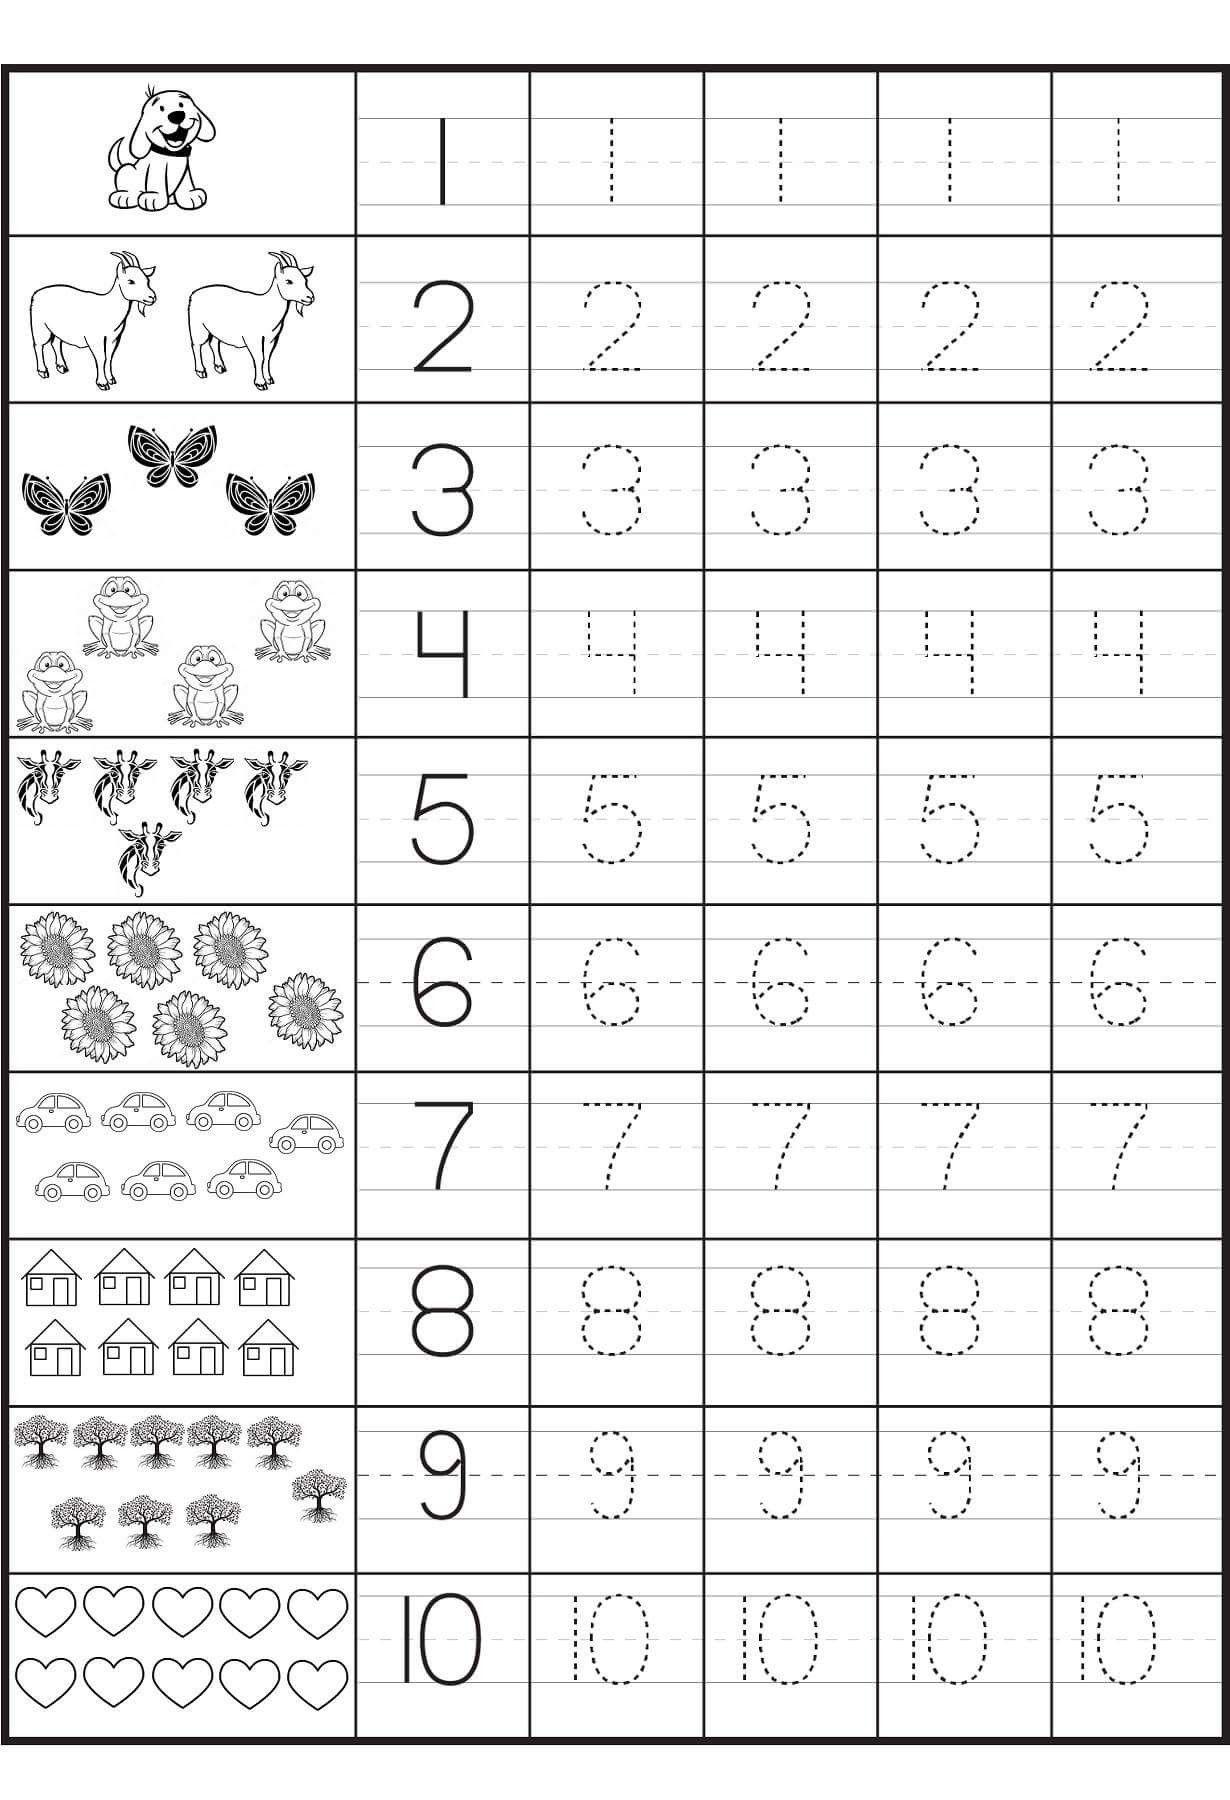 Pin By Katina Serres On Preschool Learning Worksheets